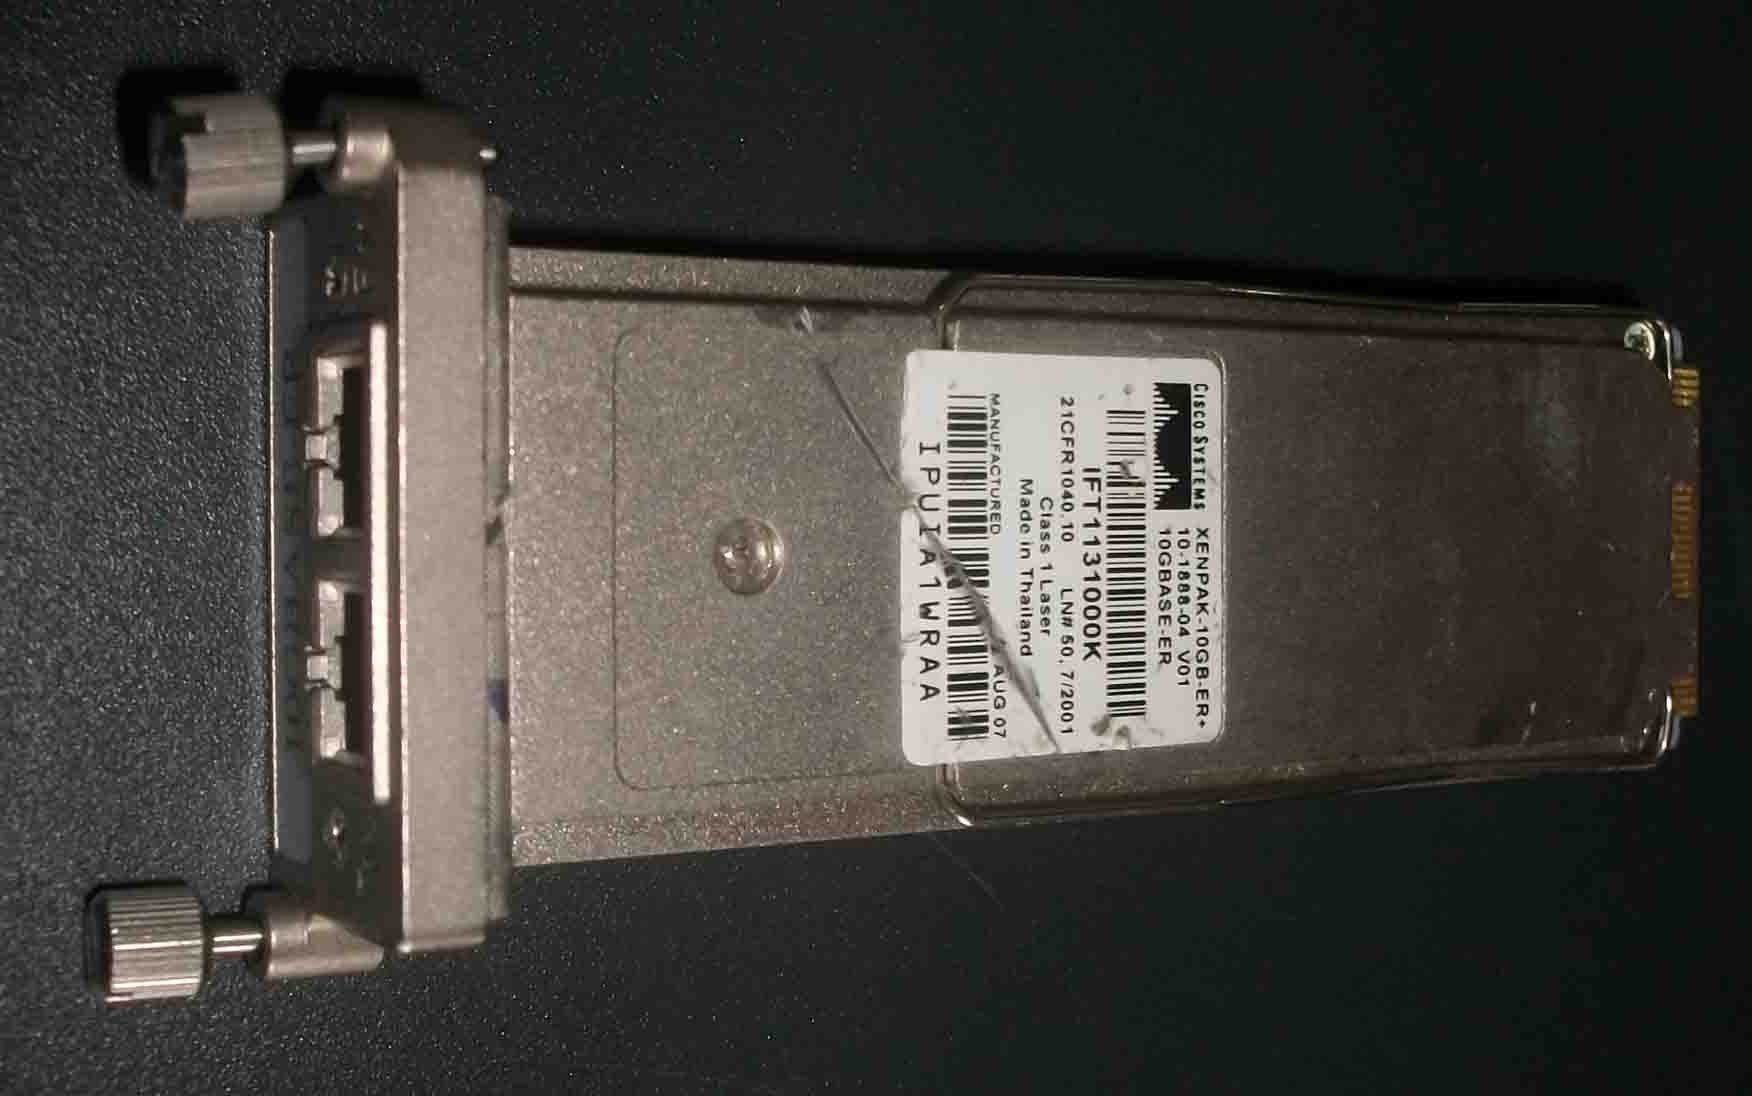 XENPAK-10GB-ER + =XENPAK-10GB-ER + =